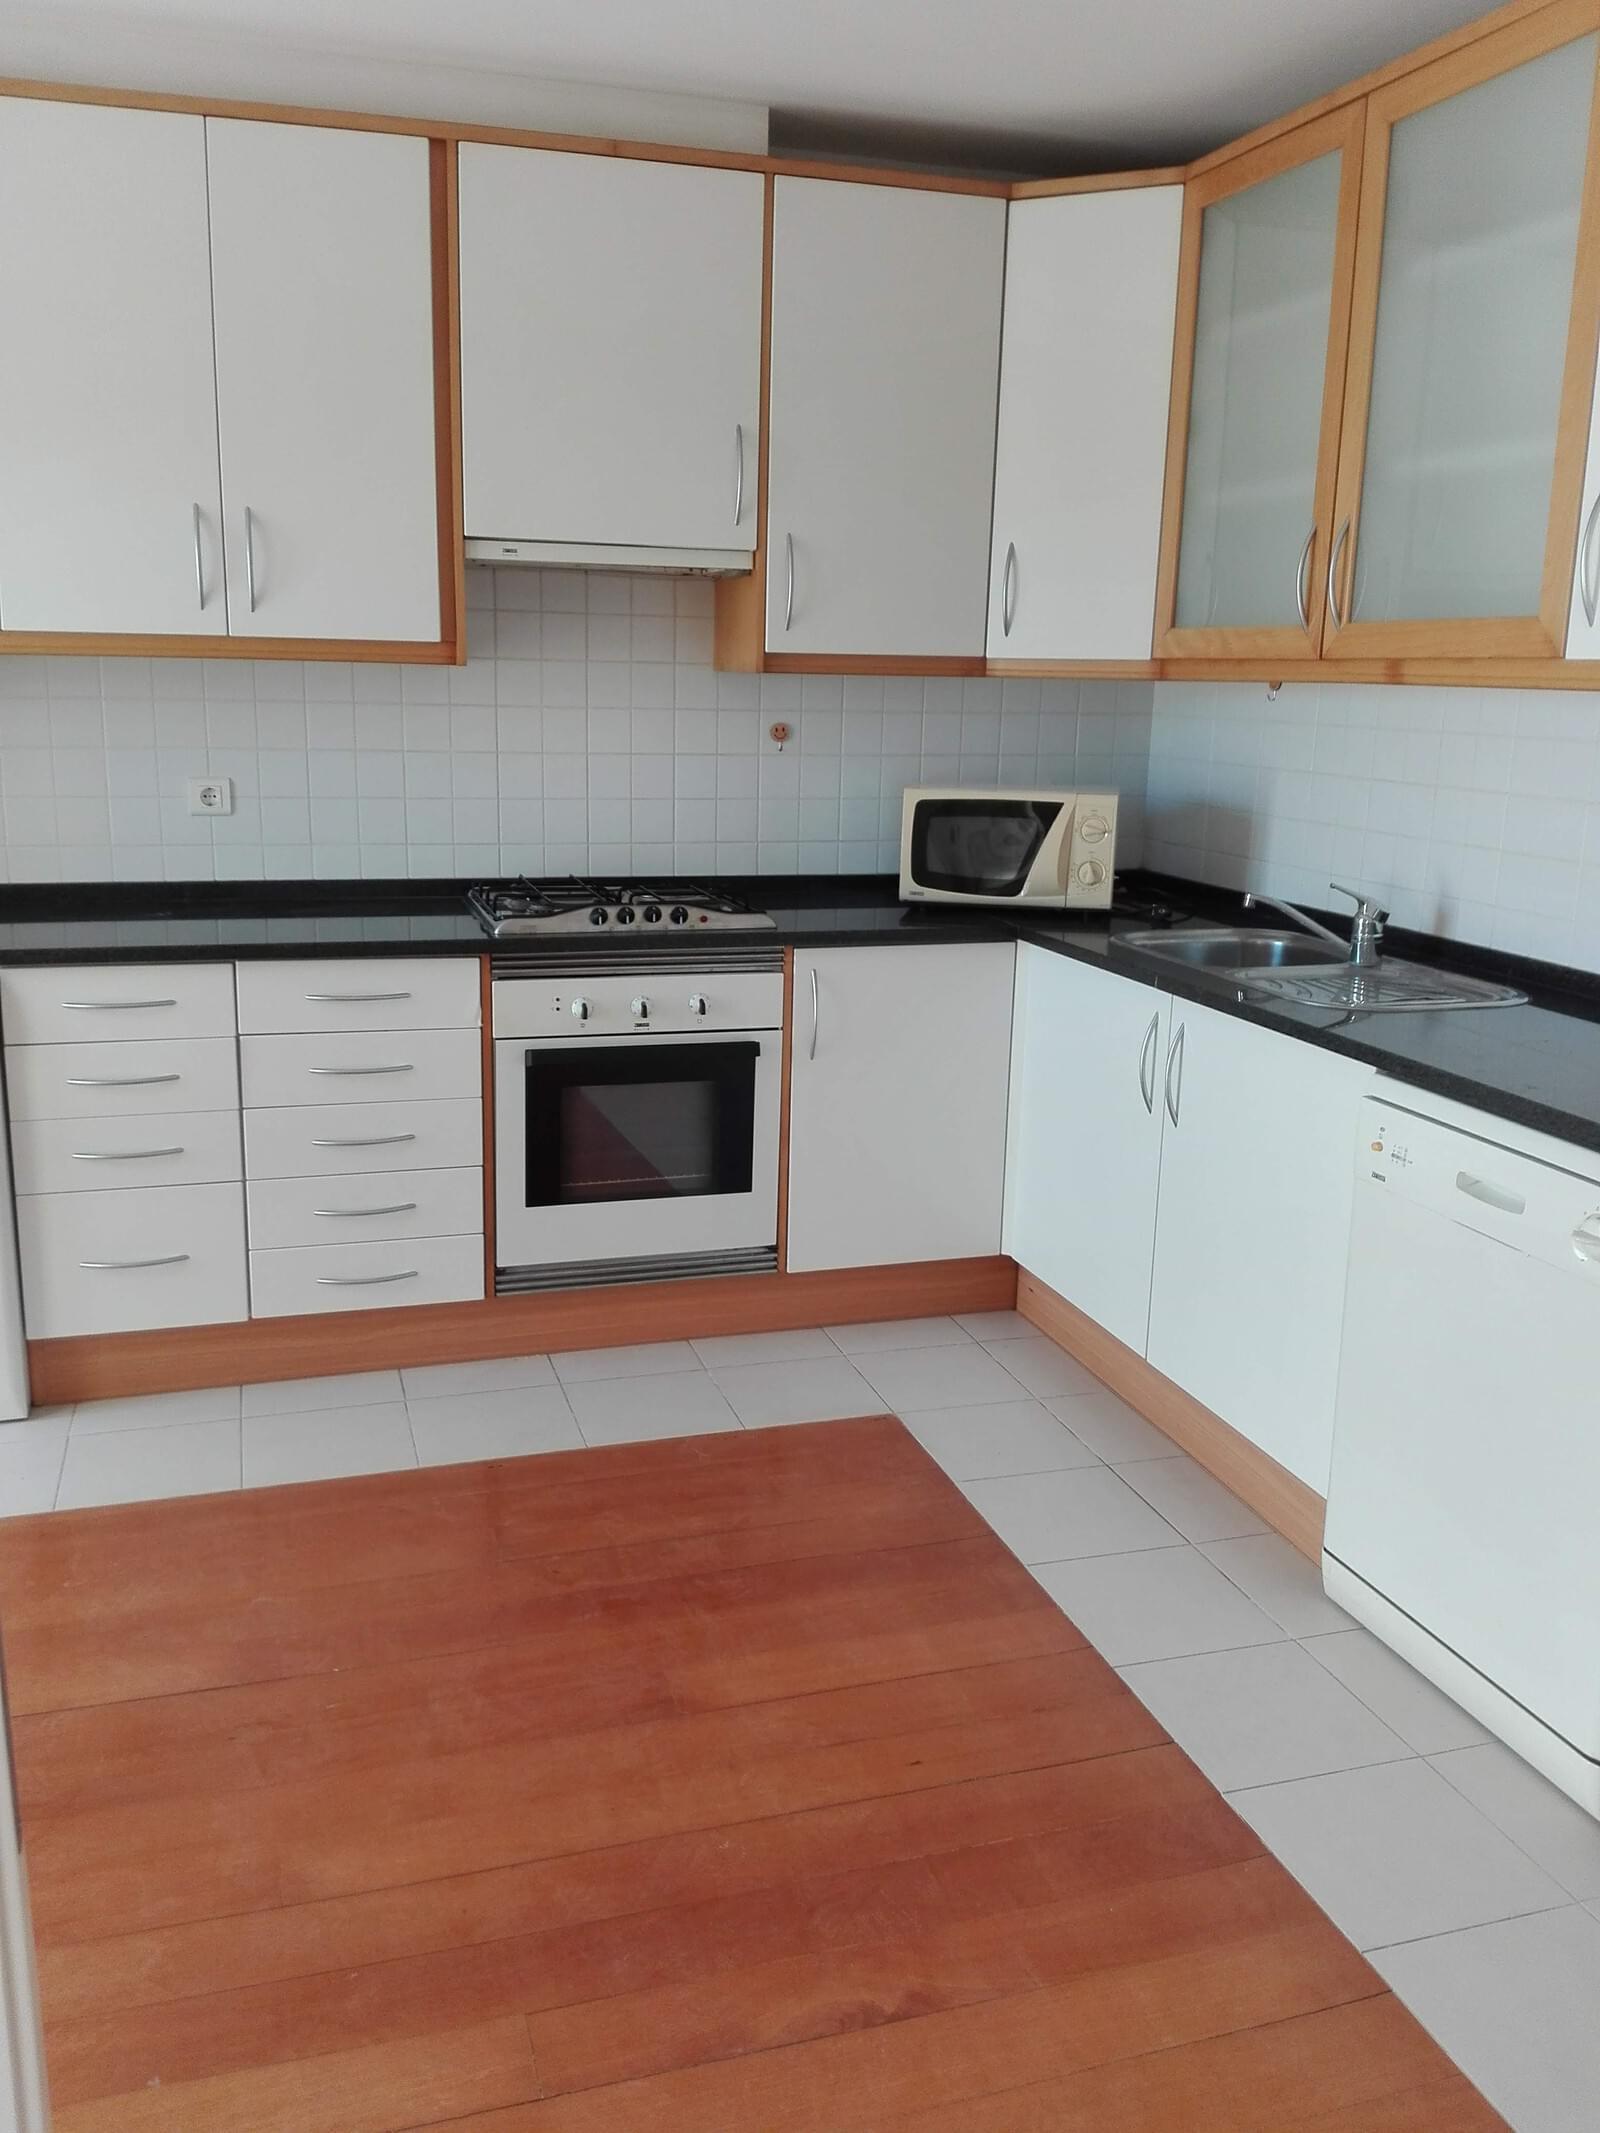 pf17908-apartamento-t1-lisboa-db7aae86-16d1-402d-b91b-657a72578cc0